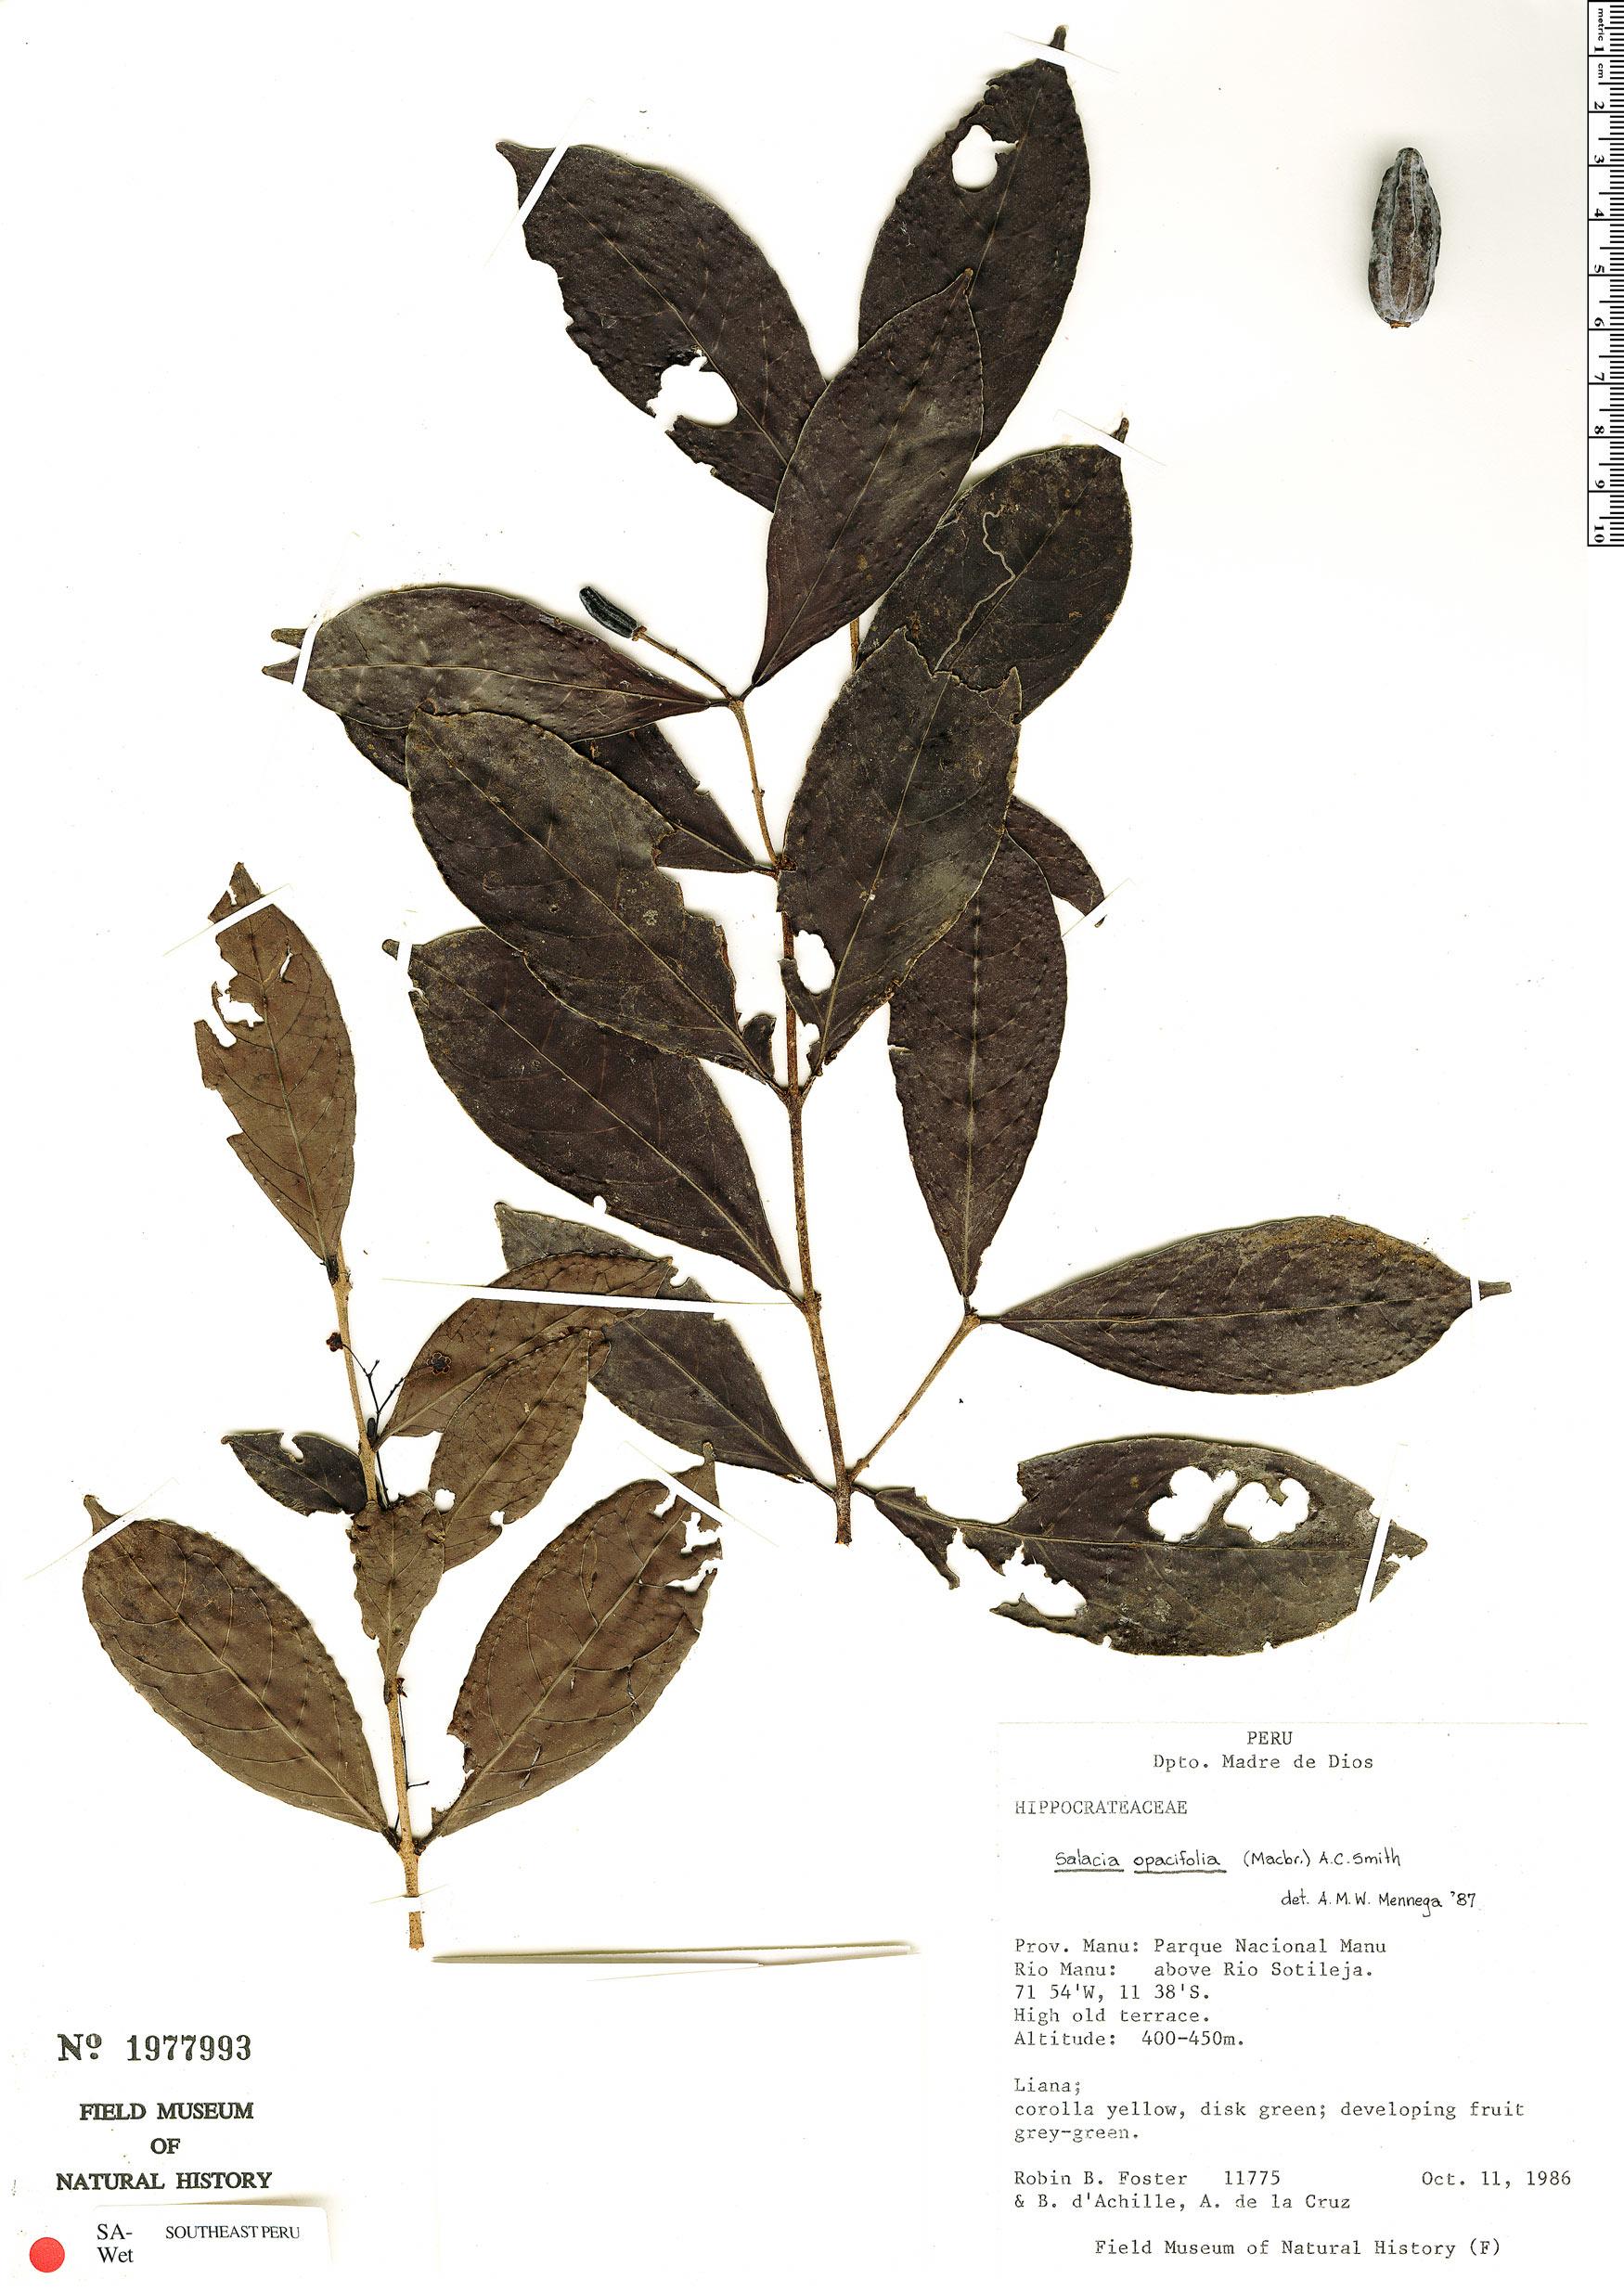 Specimen: Salacia opacifolia